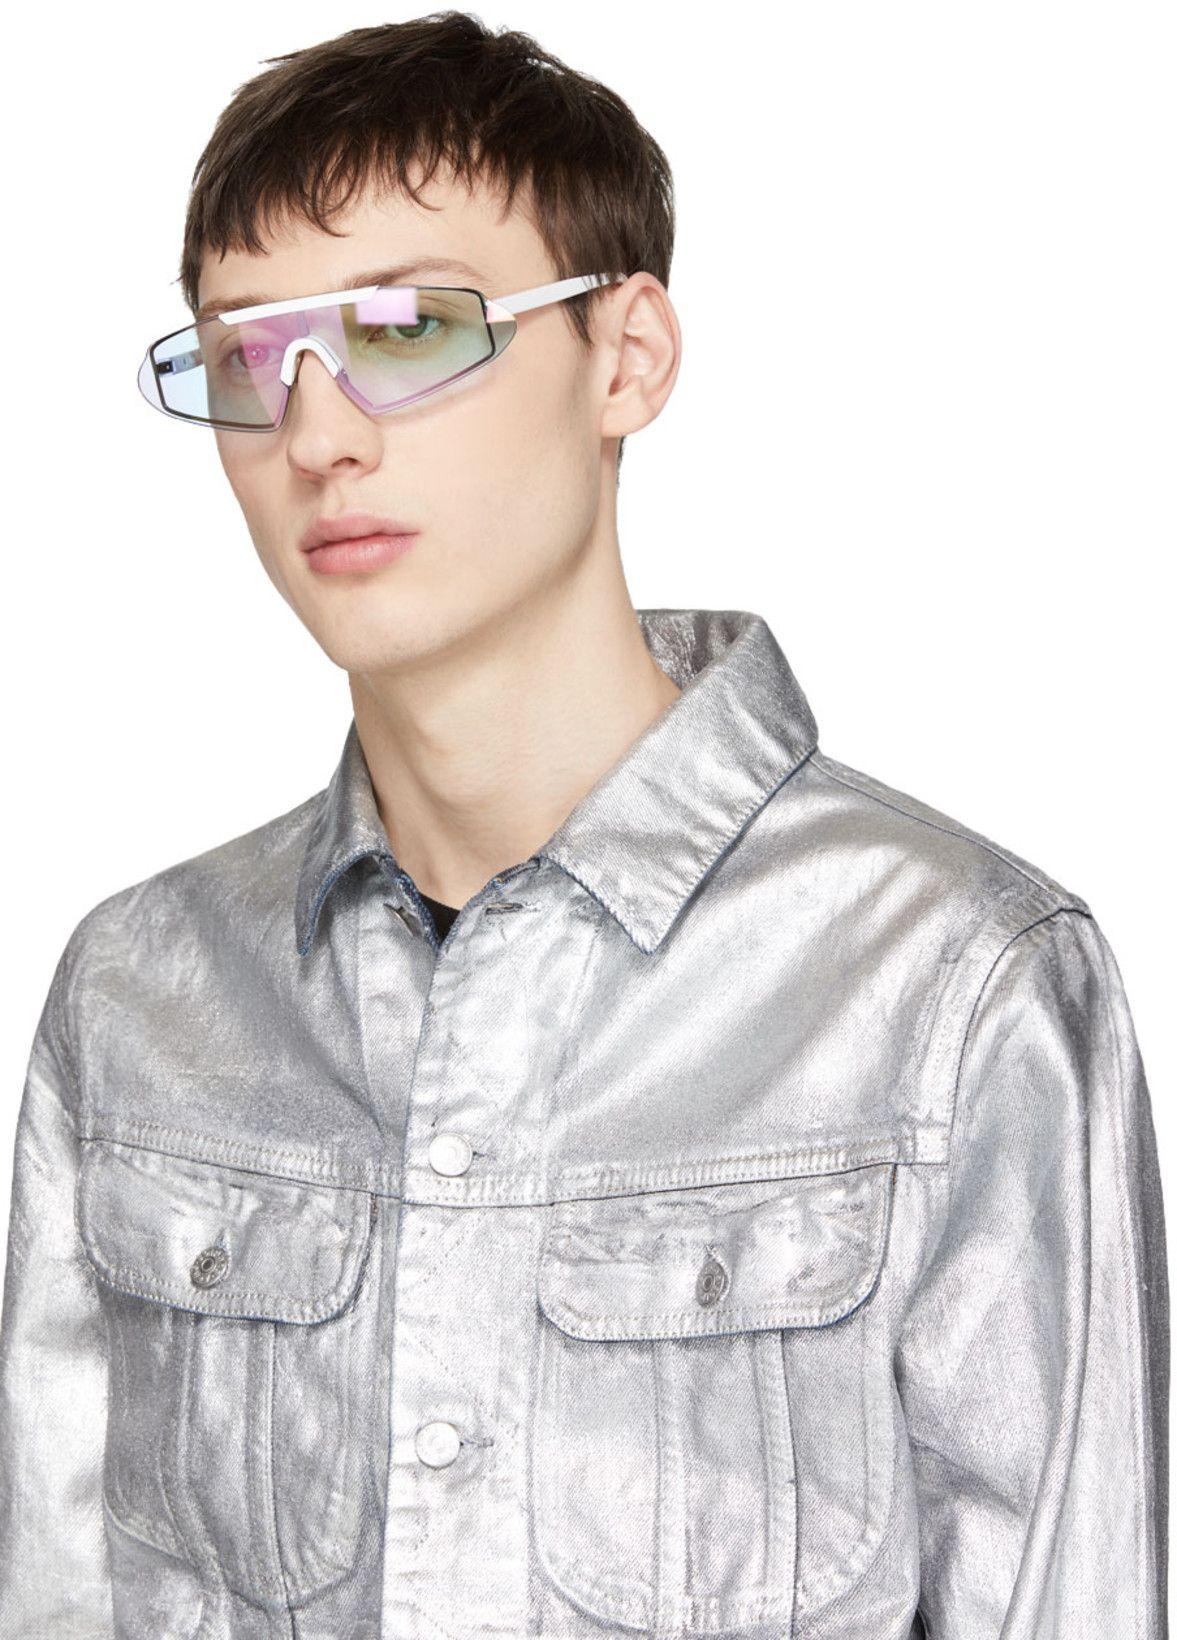 385d9592a93a7 Acne Studios - White Bornt Sunglasses